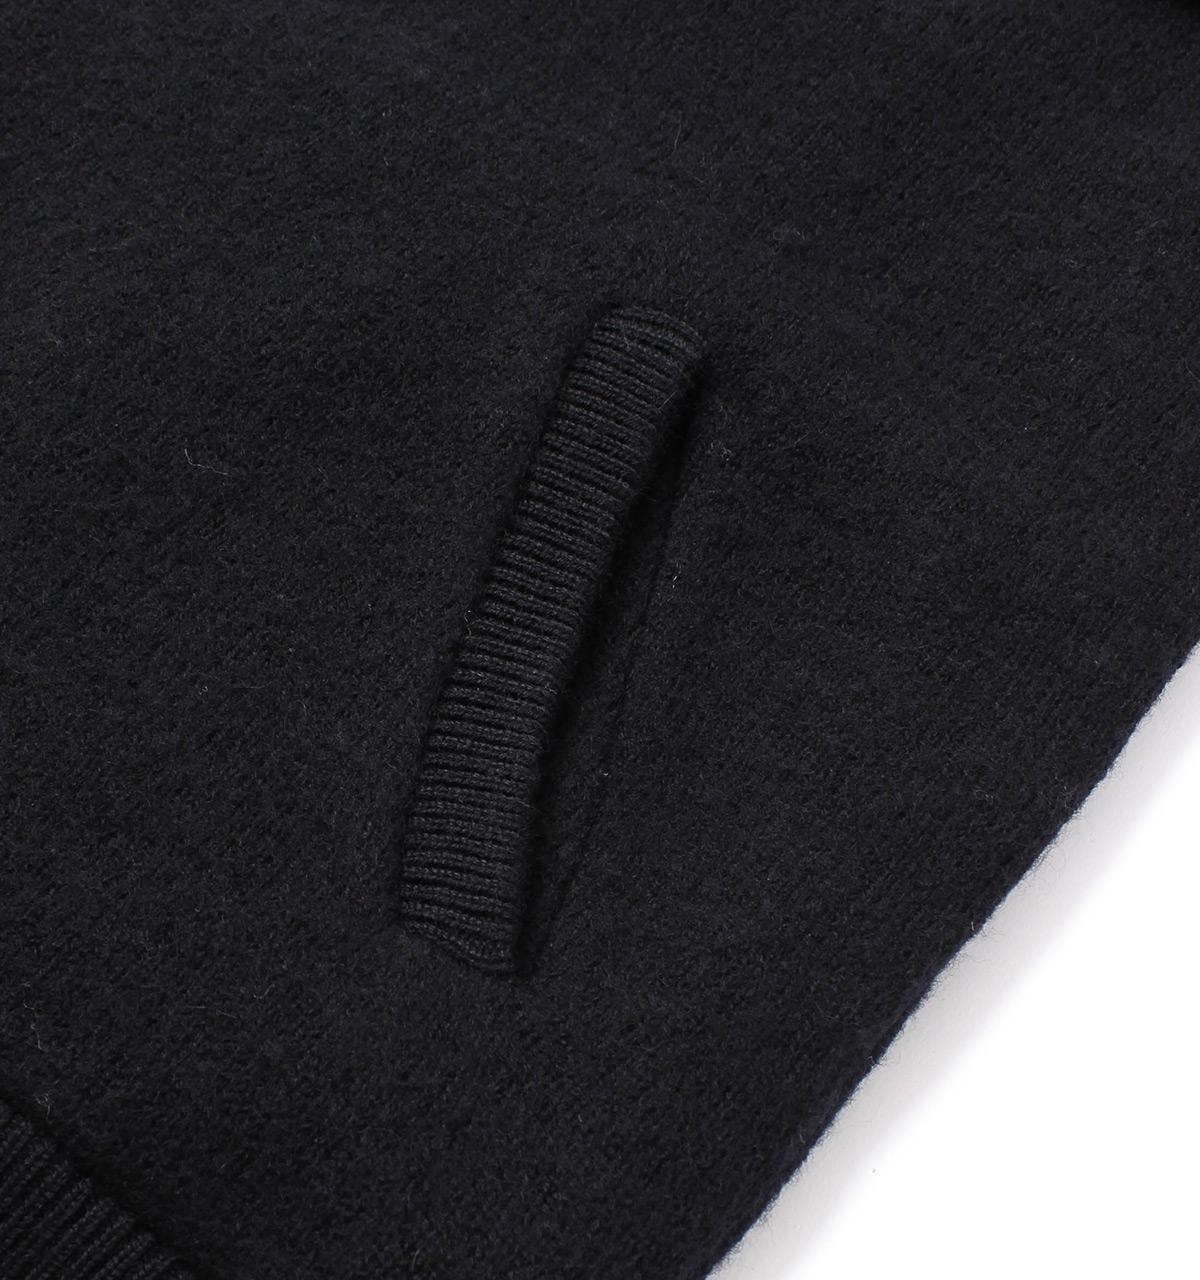 Farah Wool Macauley Black Knitted Bomber Jacket for Men